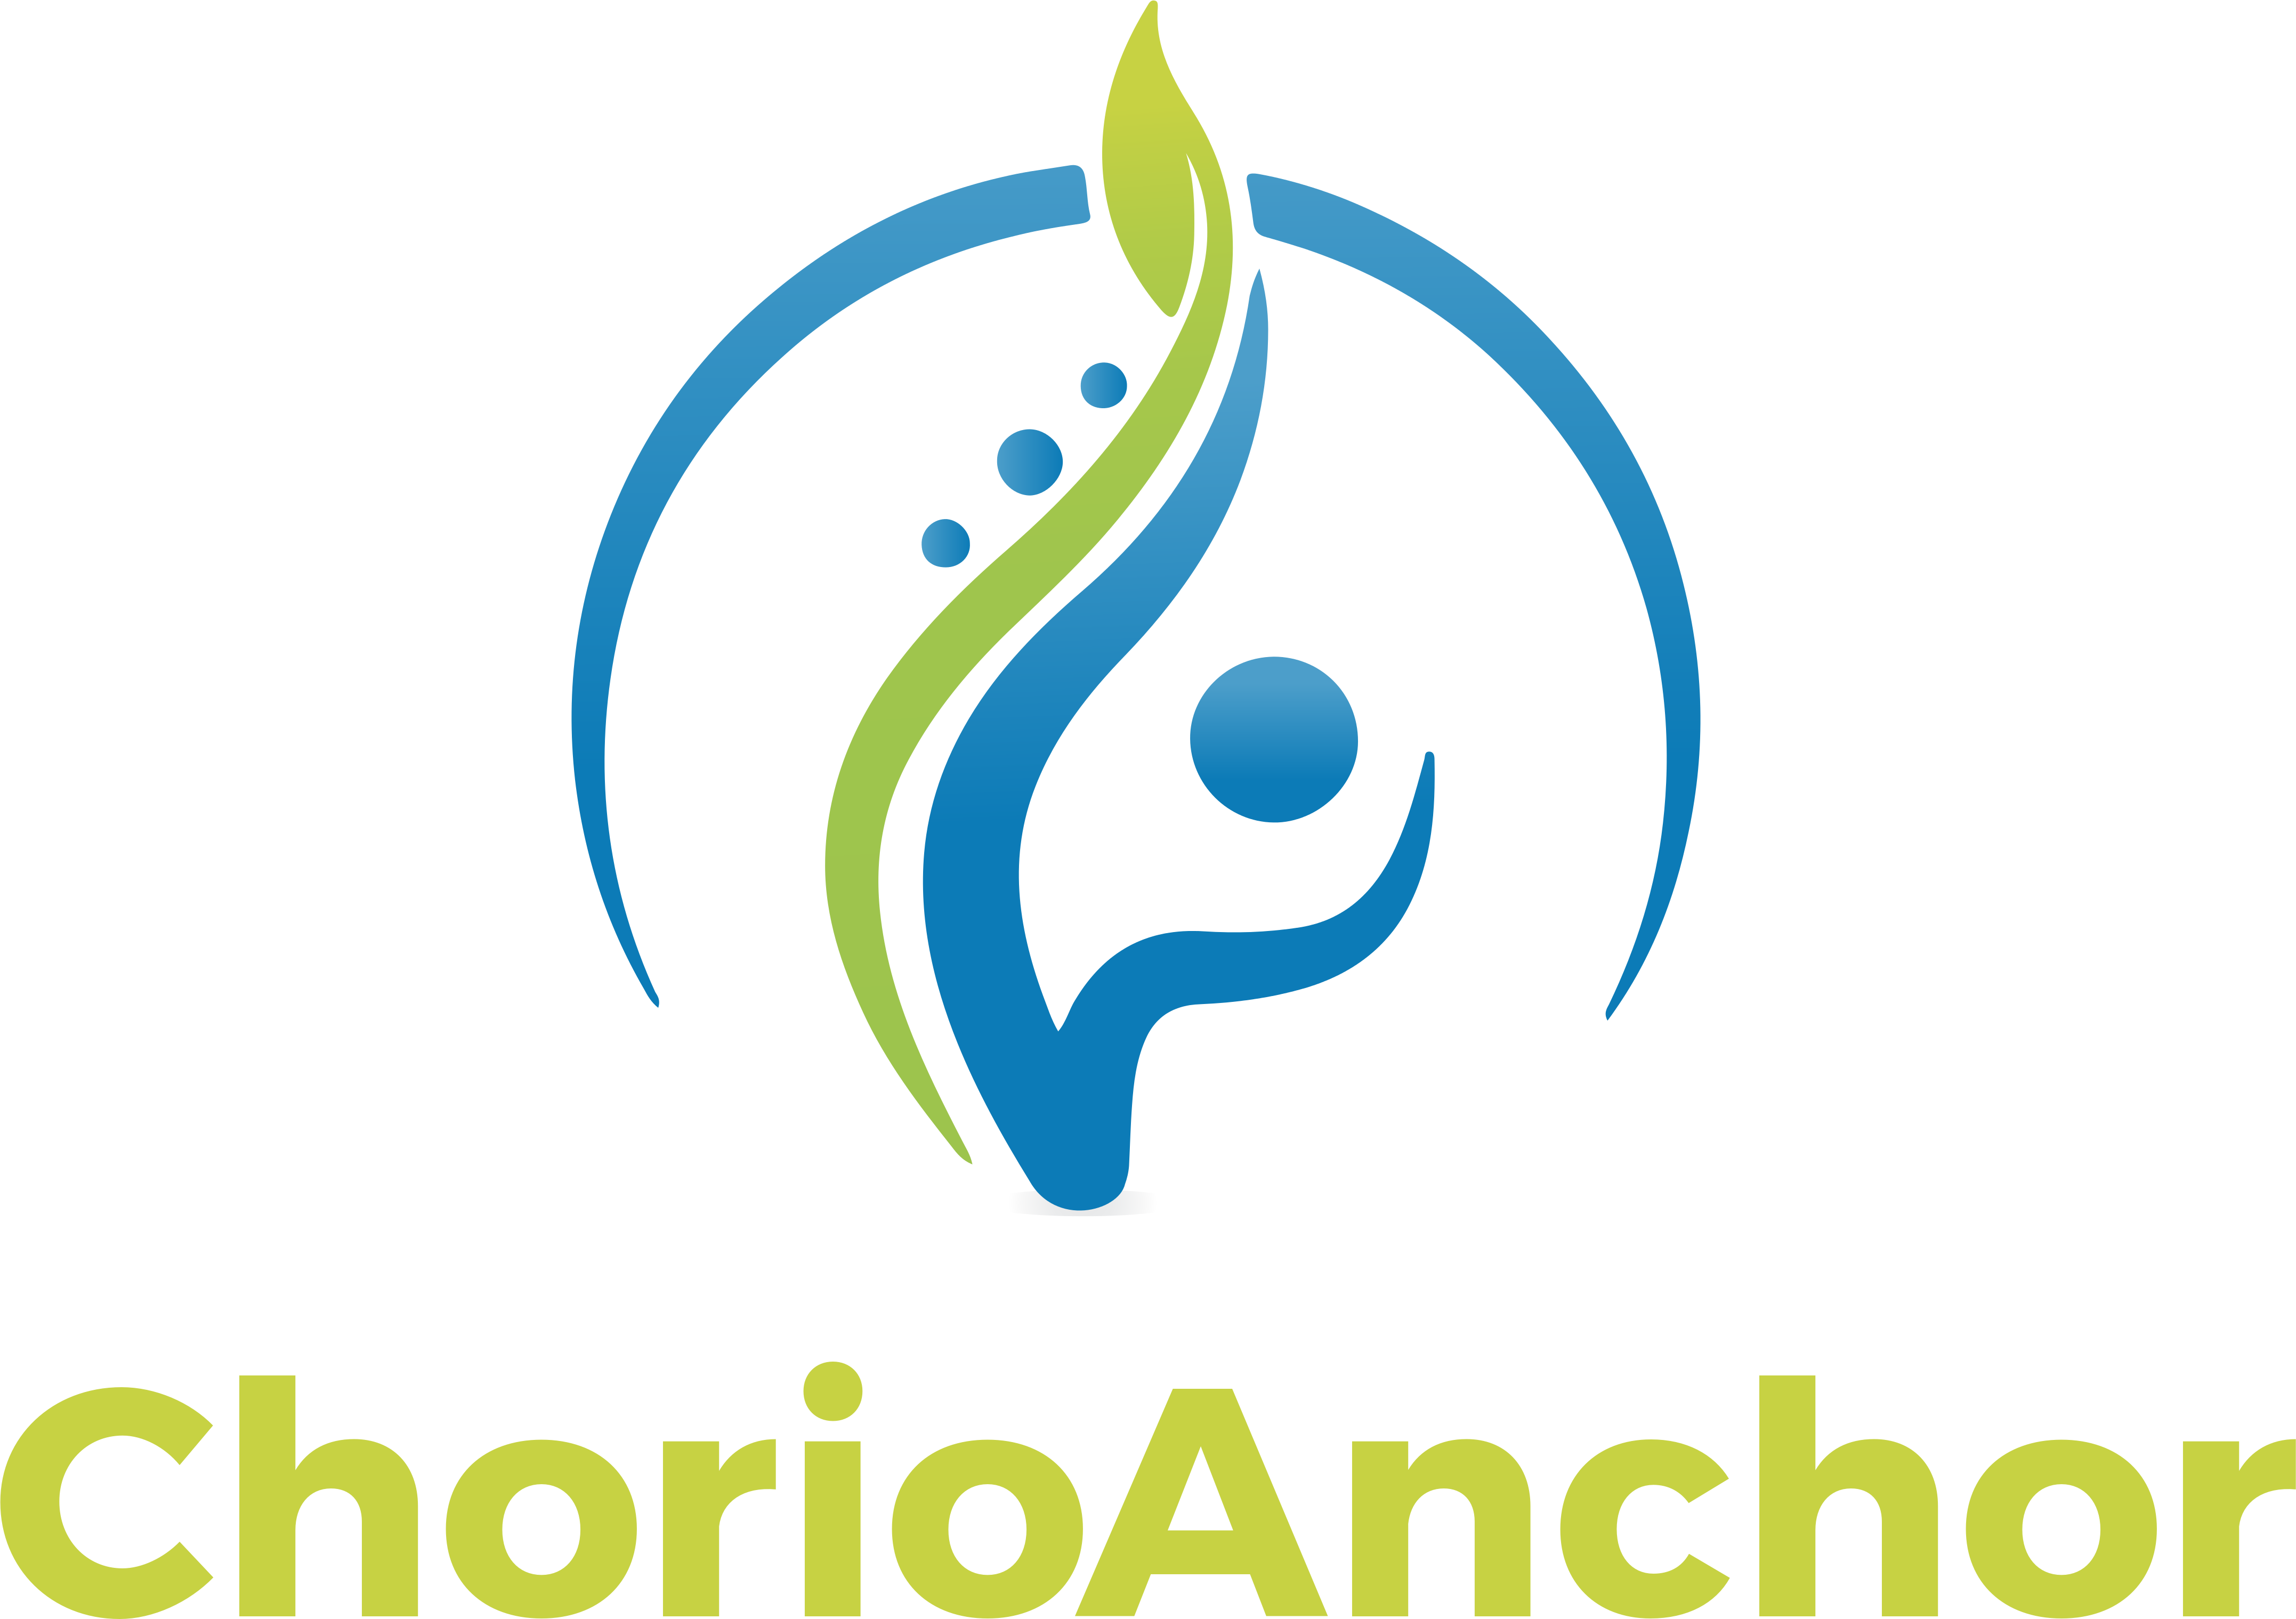 ChorioAnchor